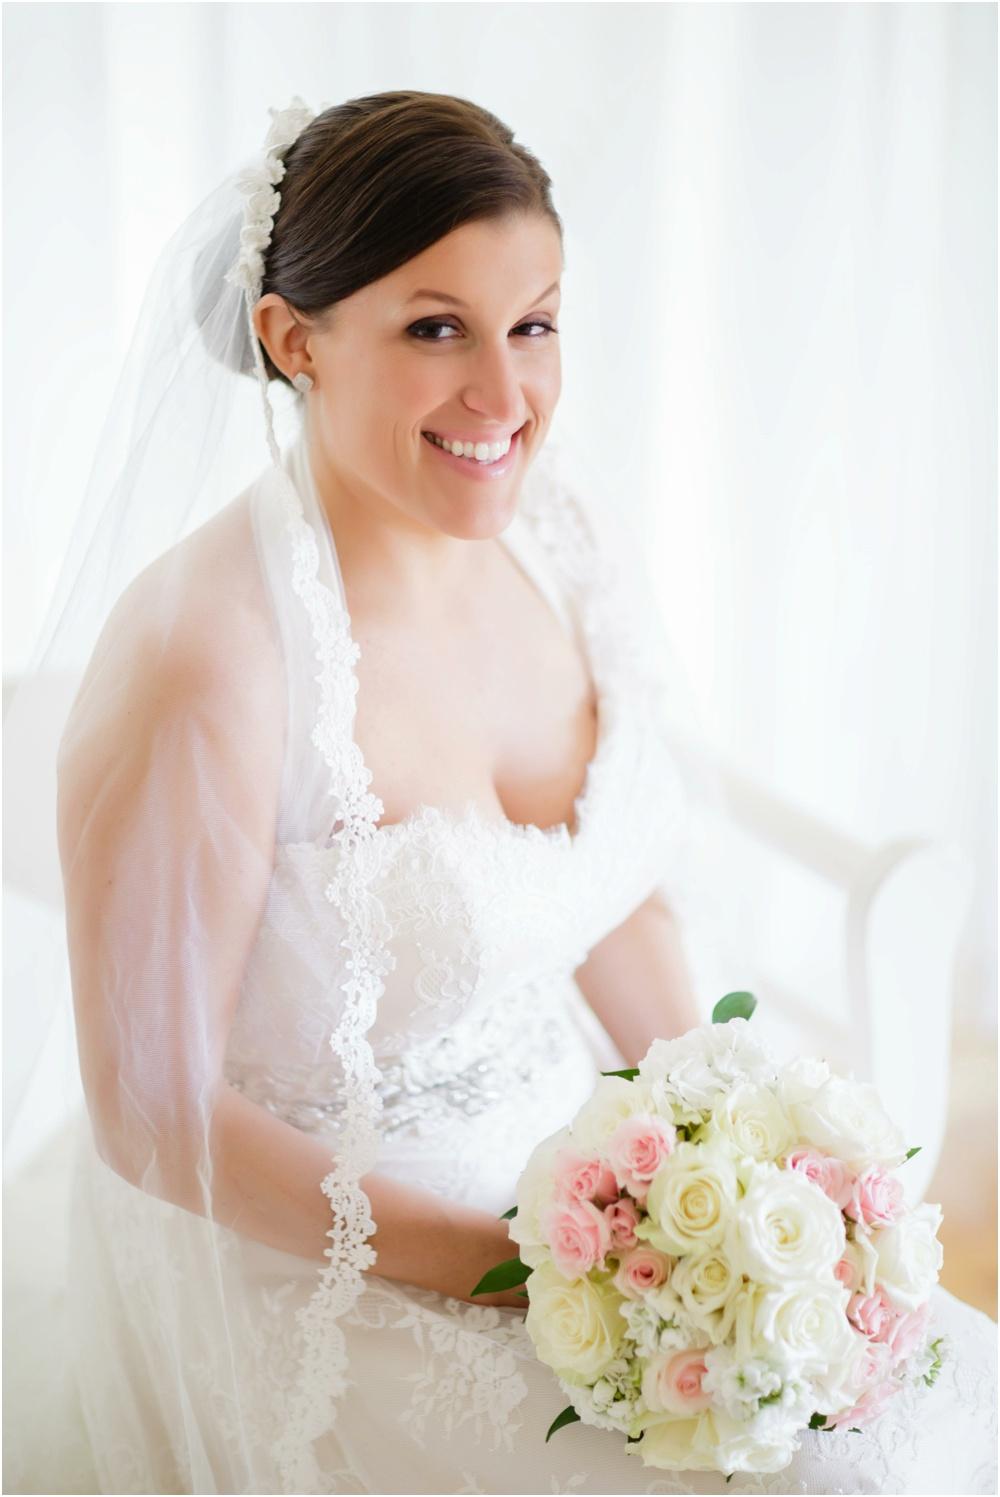 RI-Wedding-Photographer-Lefebvre-Photo-Blog_3266.jpg